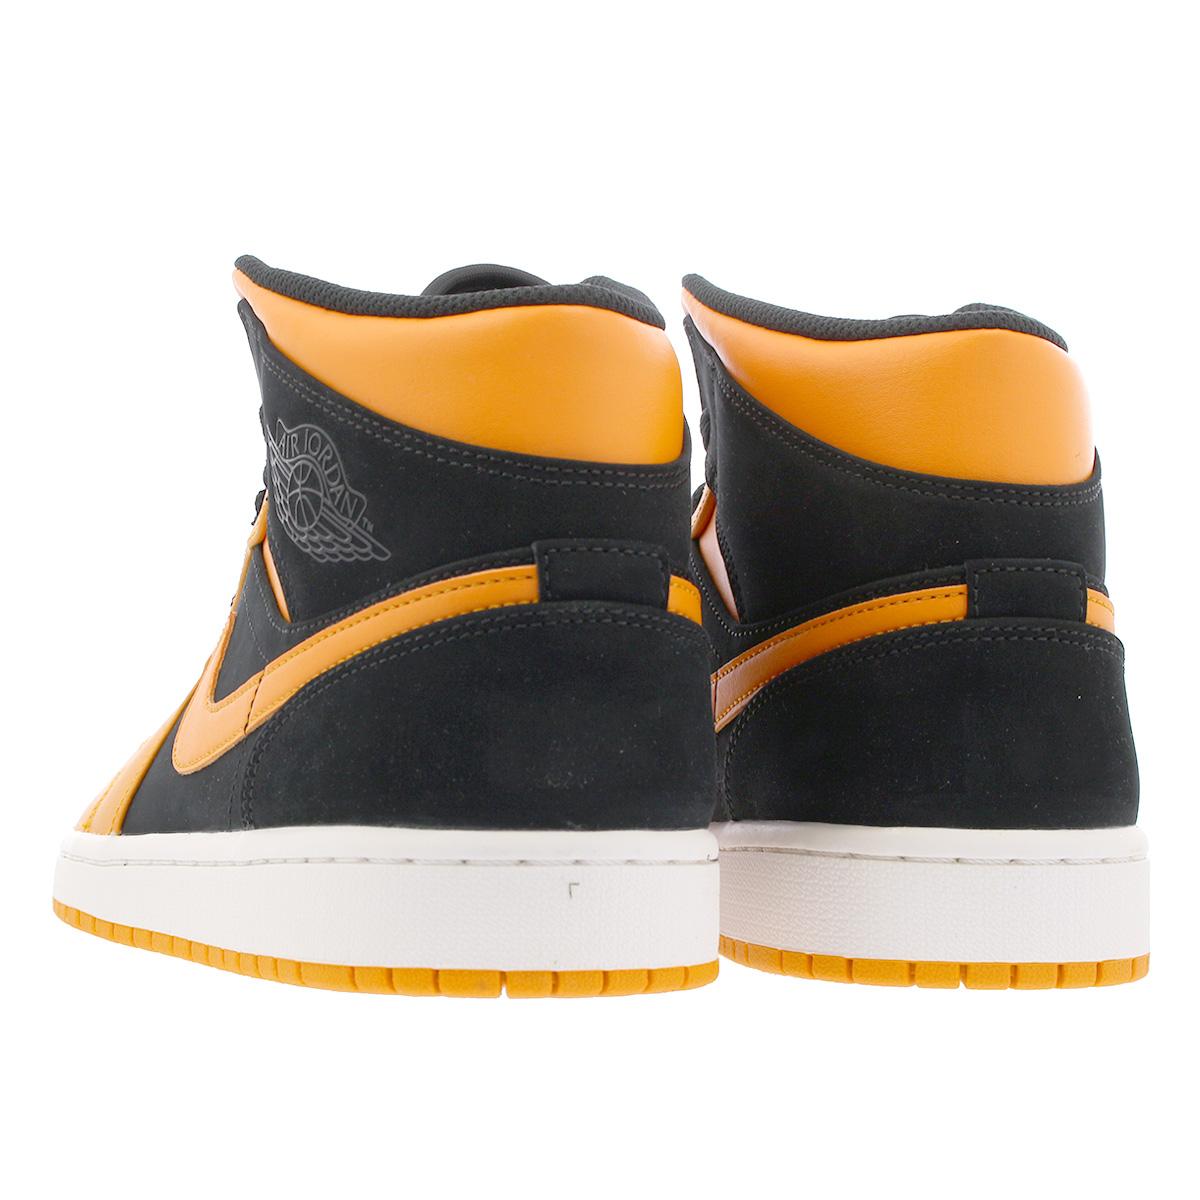 new style 3f076 292f9 NIKE AIR JORDAN 1 MID Nike Air Jordan 1 mid BLACK ORANGE PEEL SAIL 554,724- 081